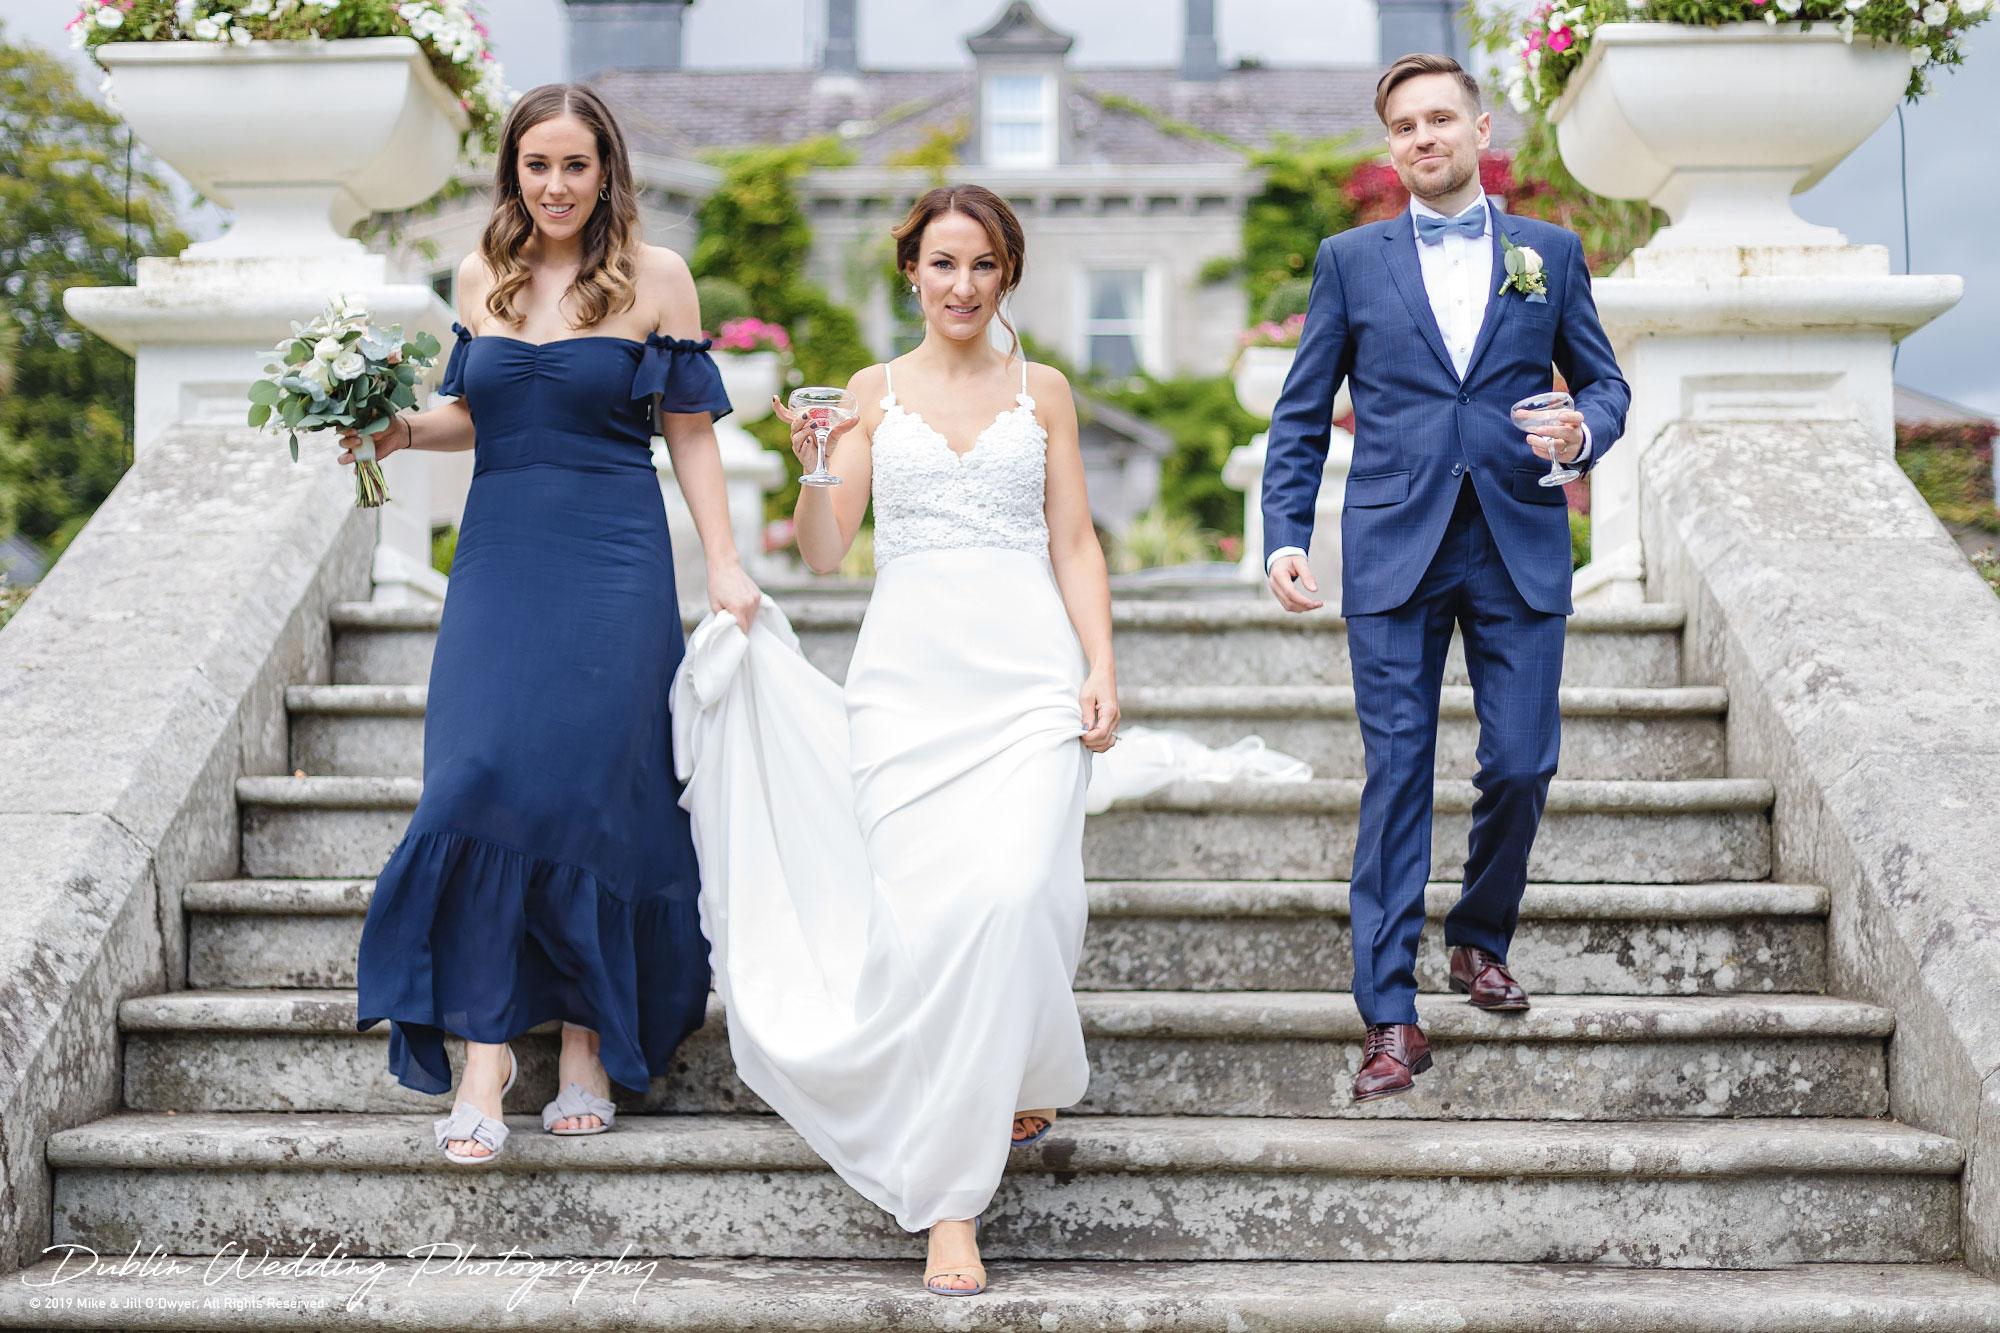 wedding-photographers-wicklow-tinakilly-house-2019-01.jpg